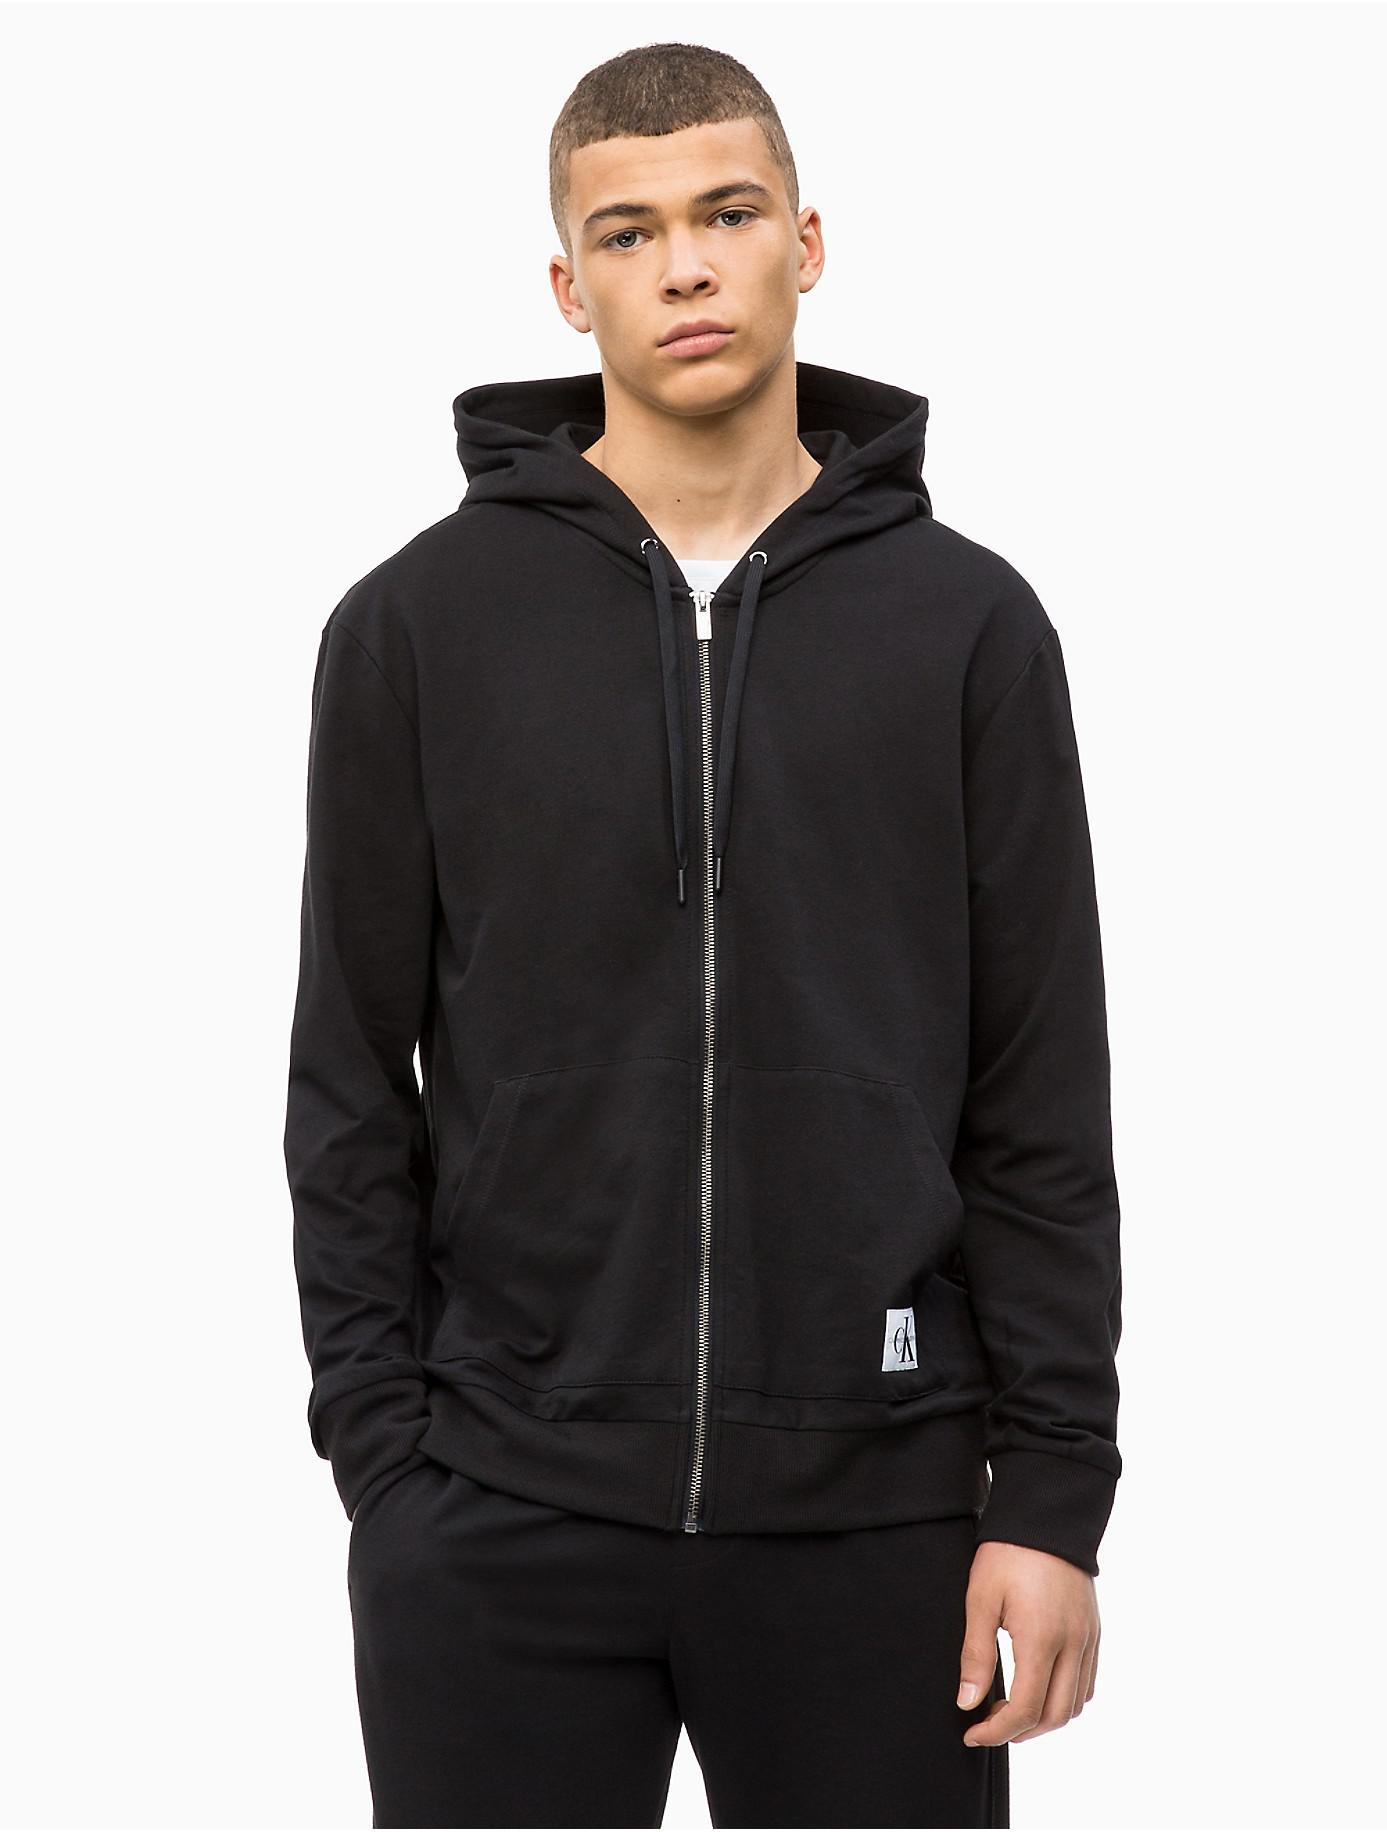 c2cfcb3afc29 Lyst - Calvin Klein Monogram Logo Lounge Zip Hoodie in Black for Men